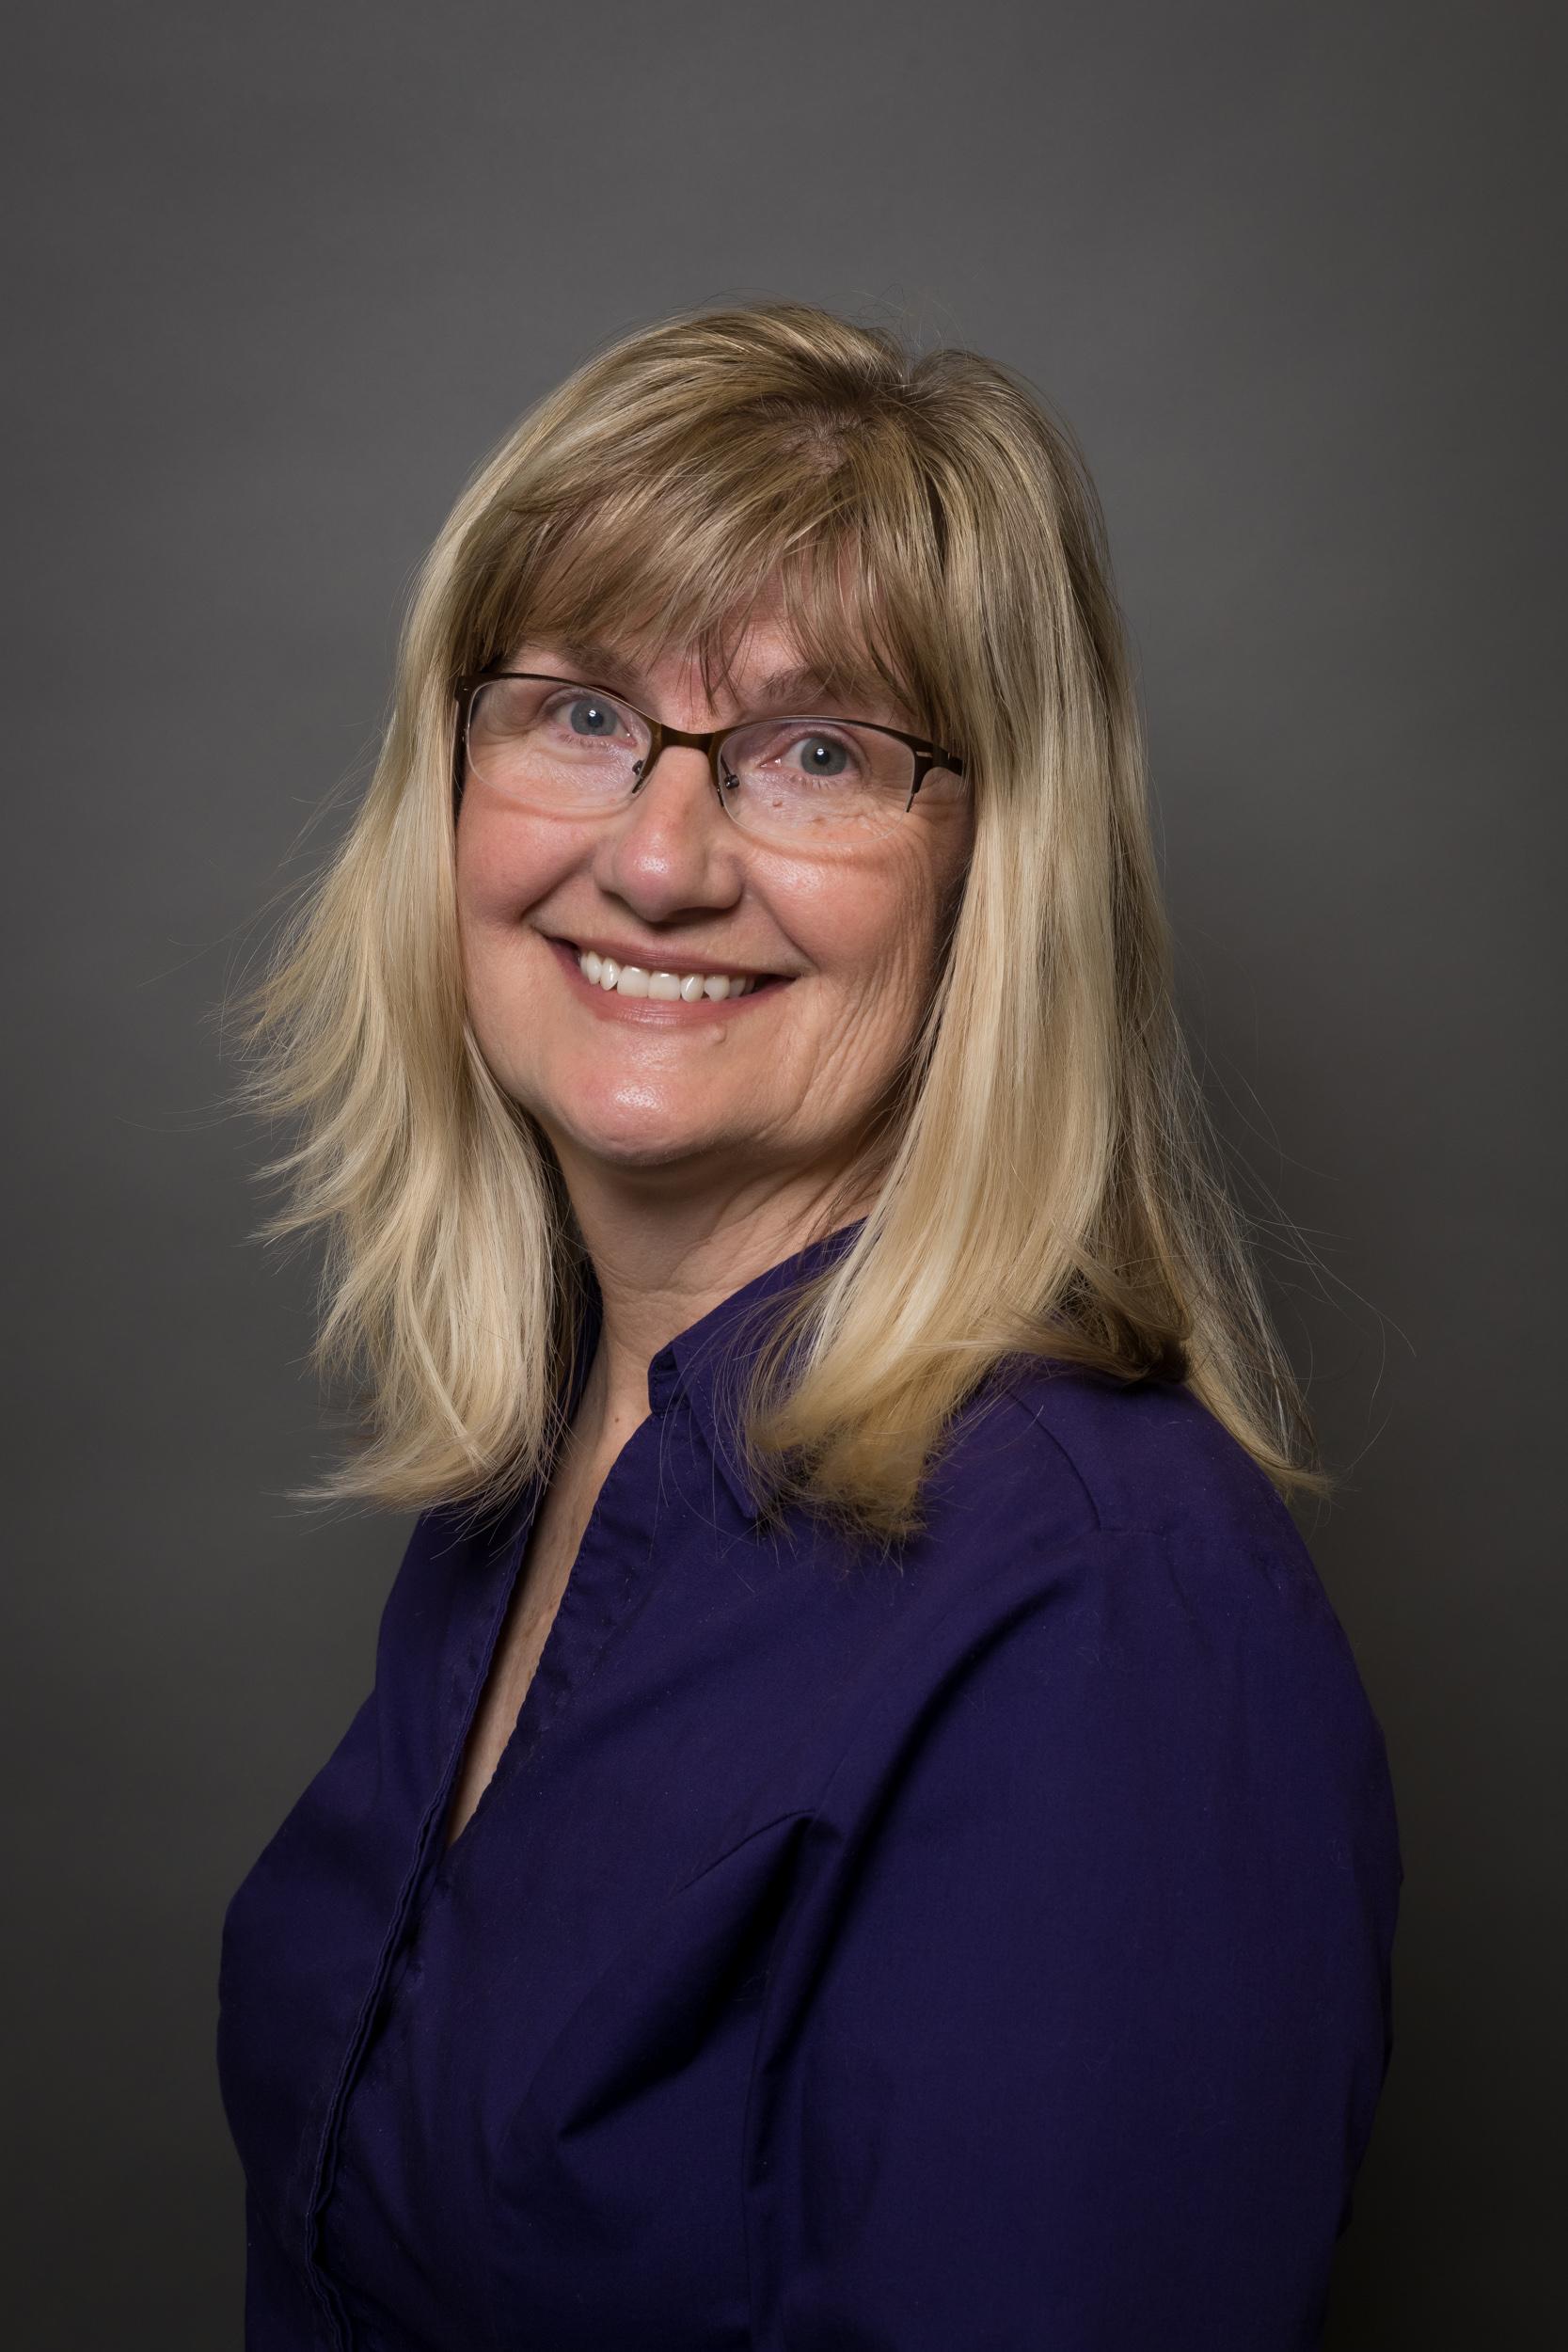 Glenda Hera - Branch Manager